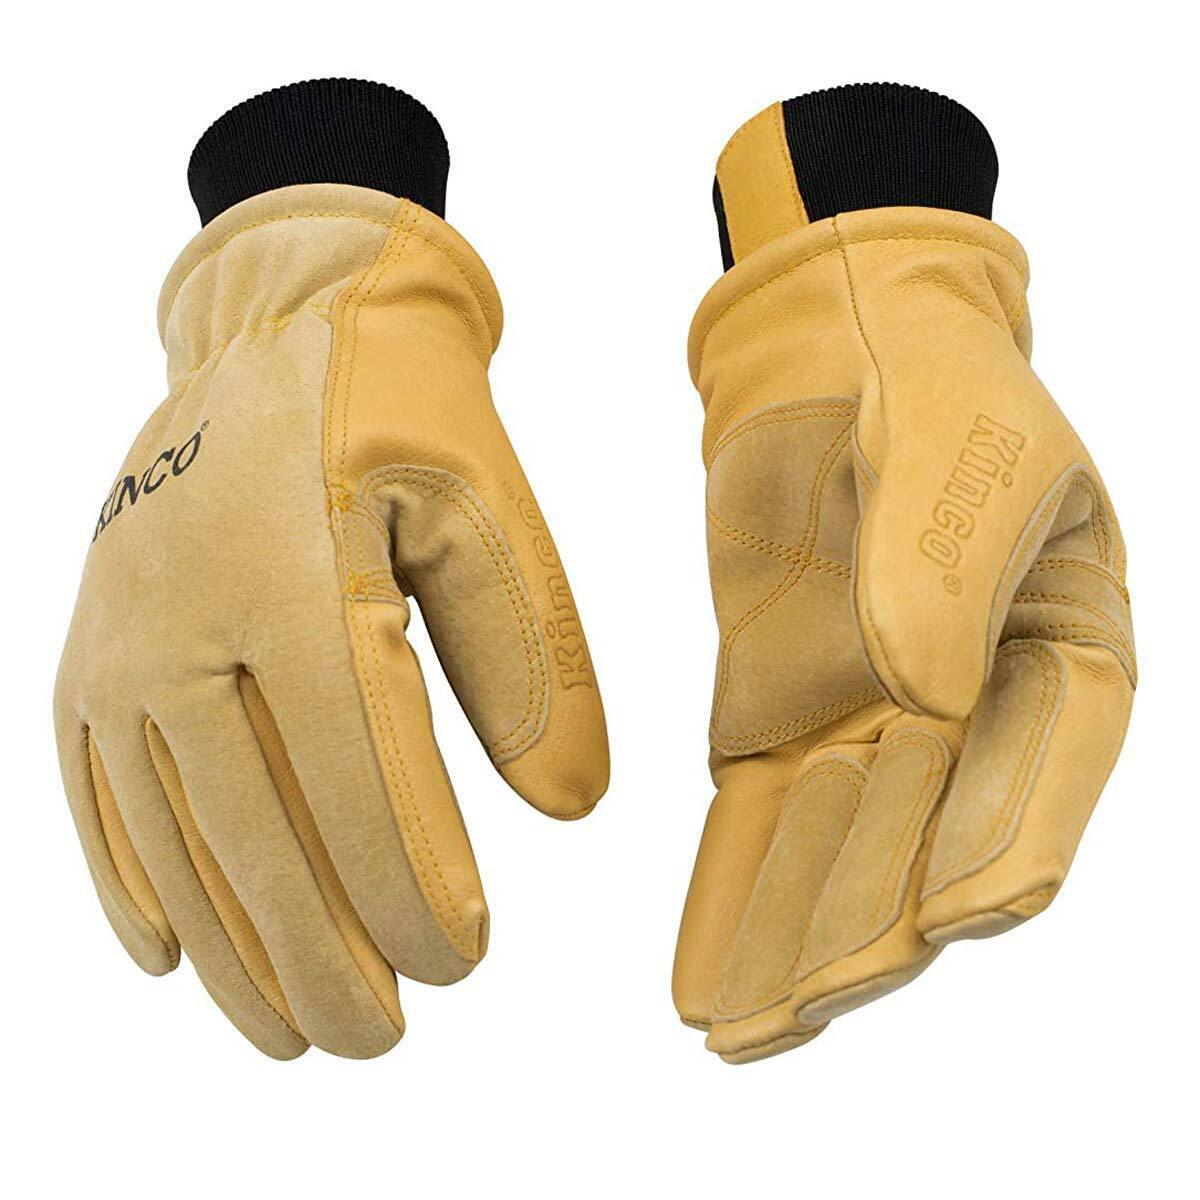 Kinco Heavy Duty Grain & Suede Pigskin Gloves 2020